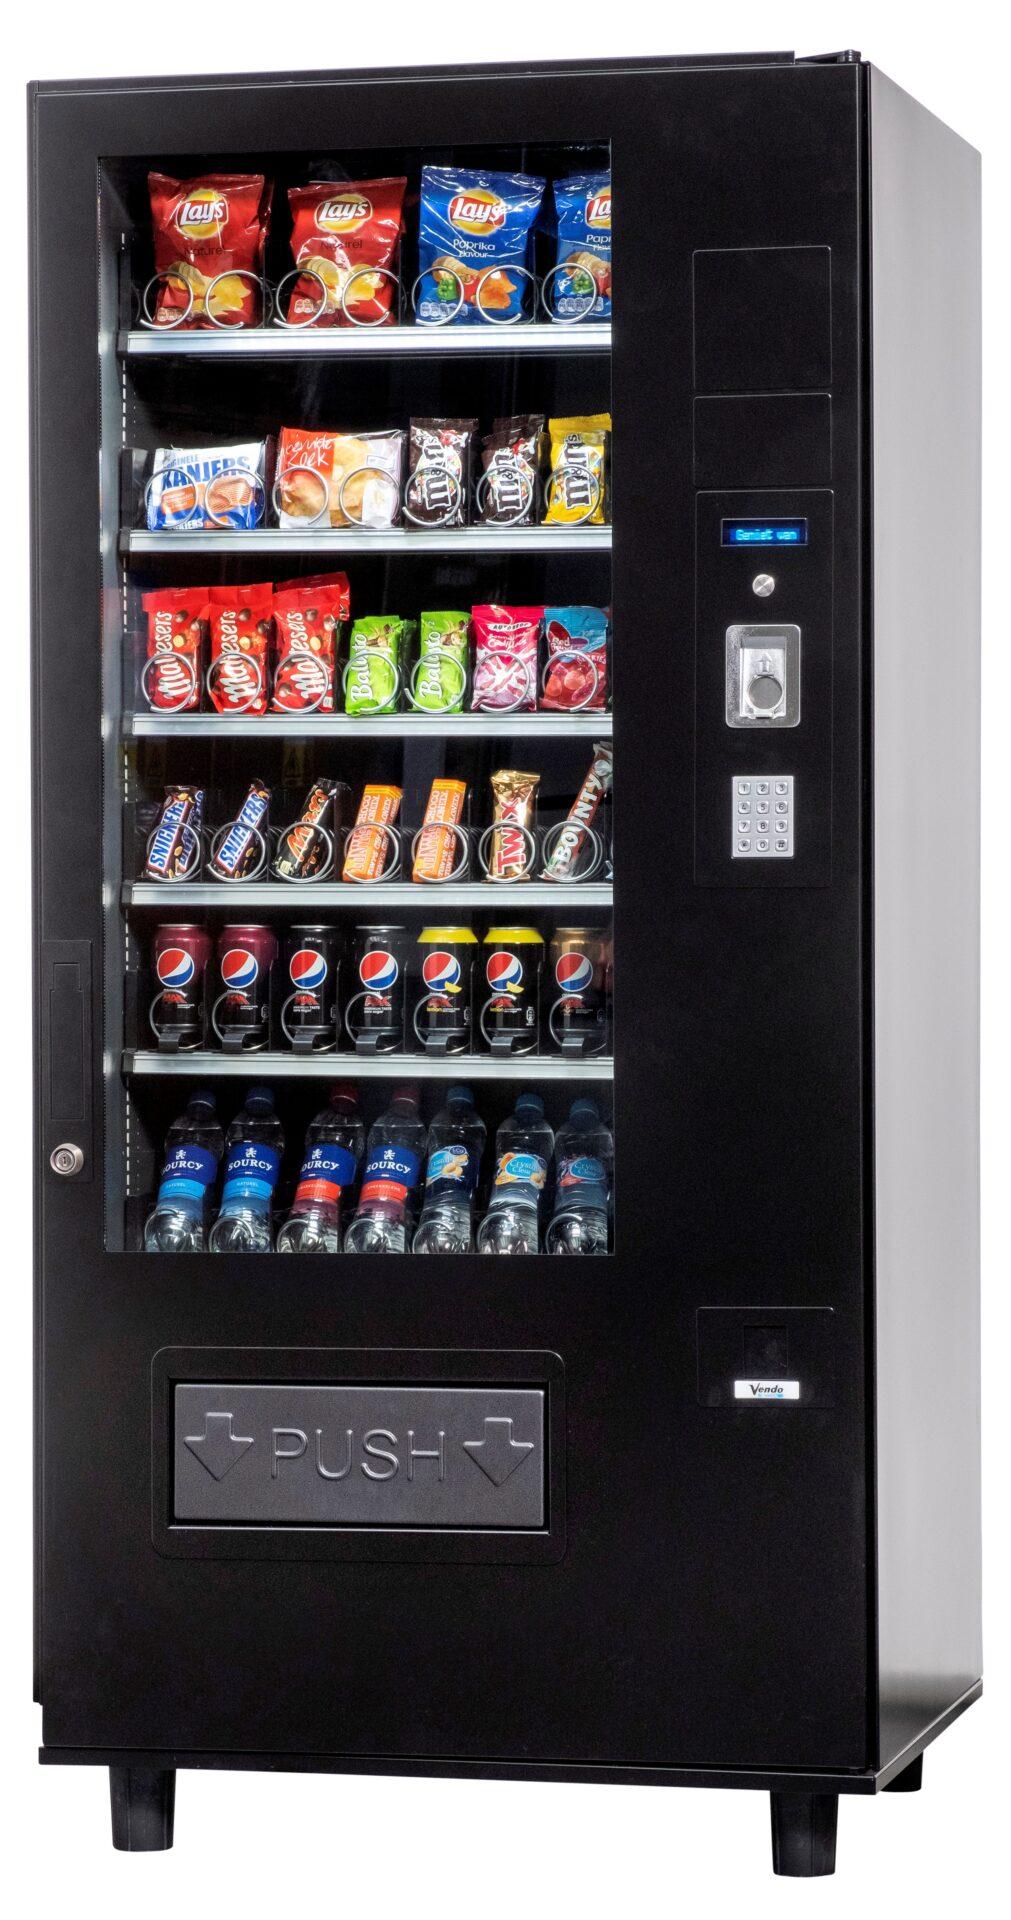 Jaski-063-Global snack economy combi2